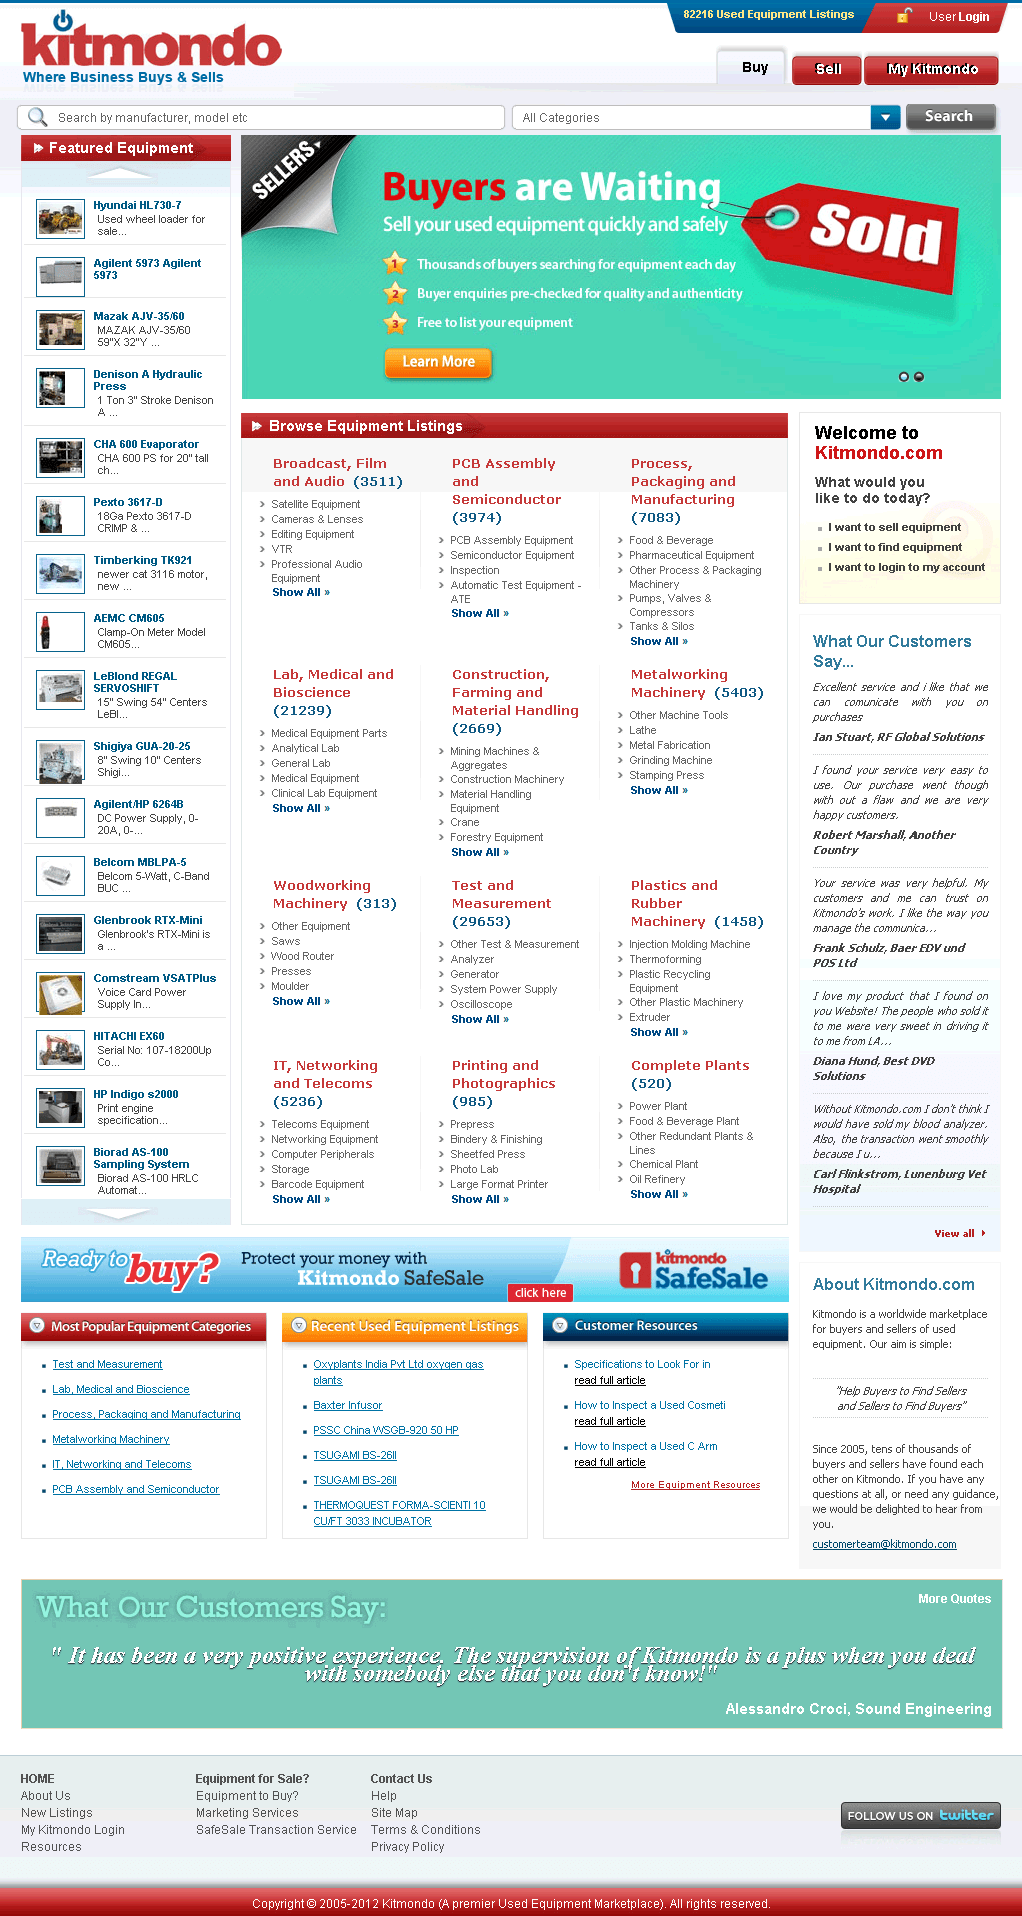 Development of ASP.NET Based Equipment Listing Site